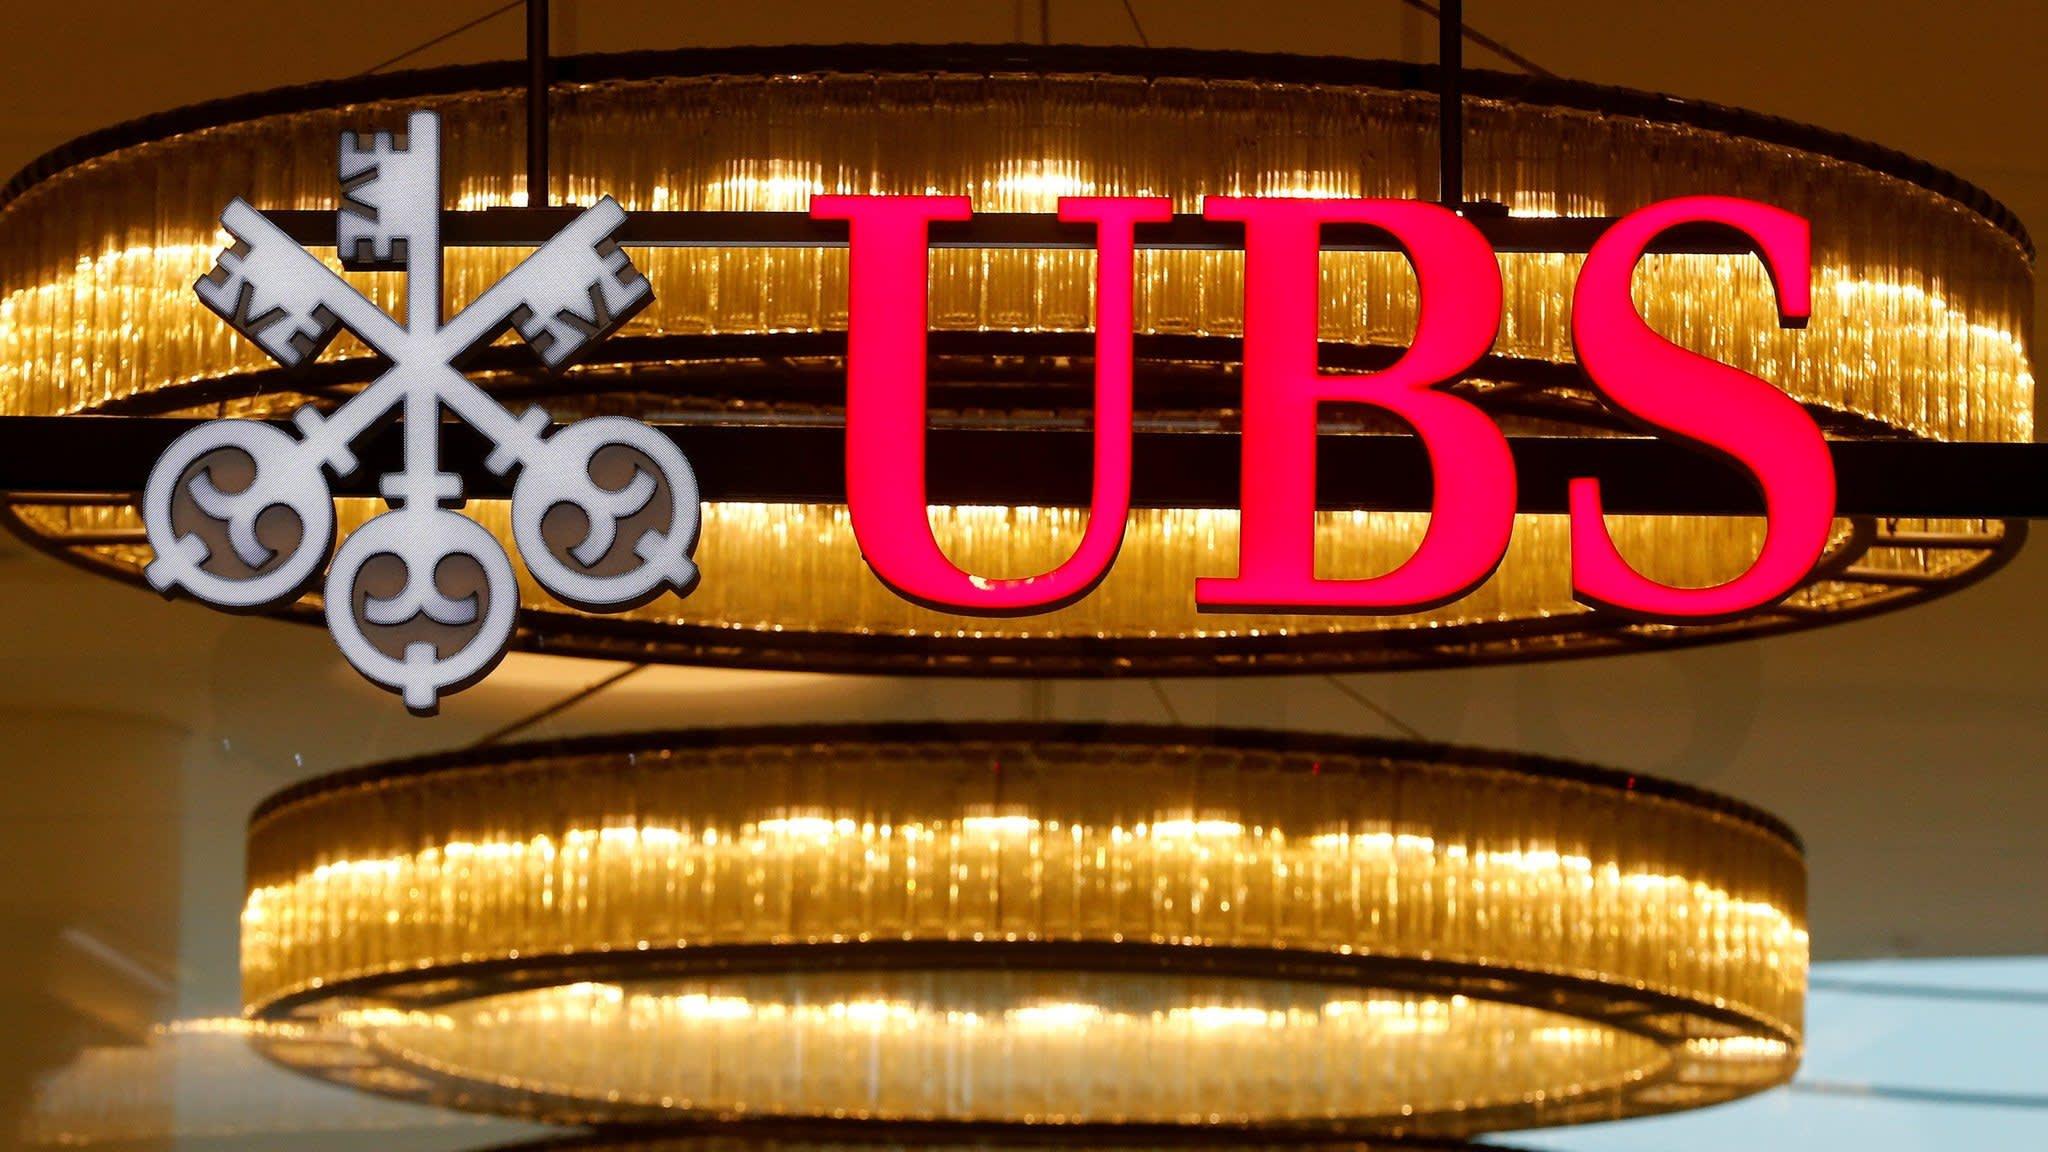 UBS employee 'used burner phones for insider tips'